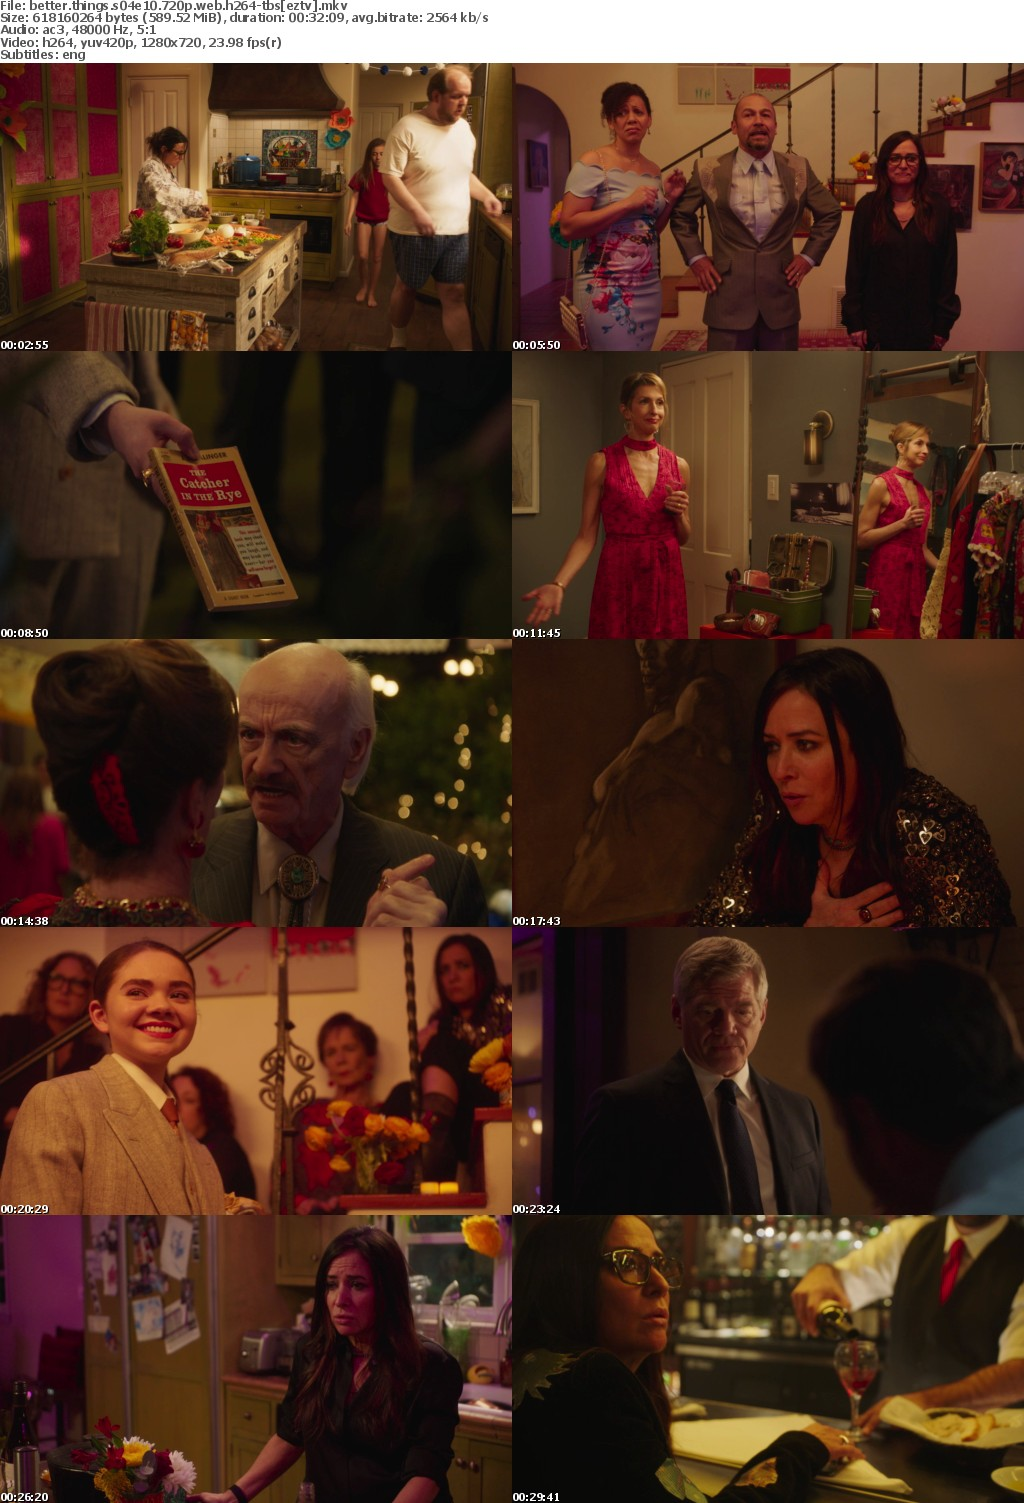 Better Things S04E10 720p WEB h264-TBS